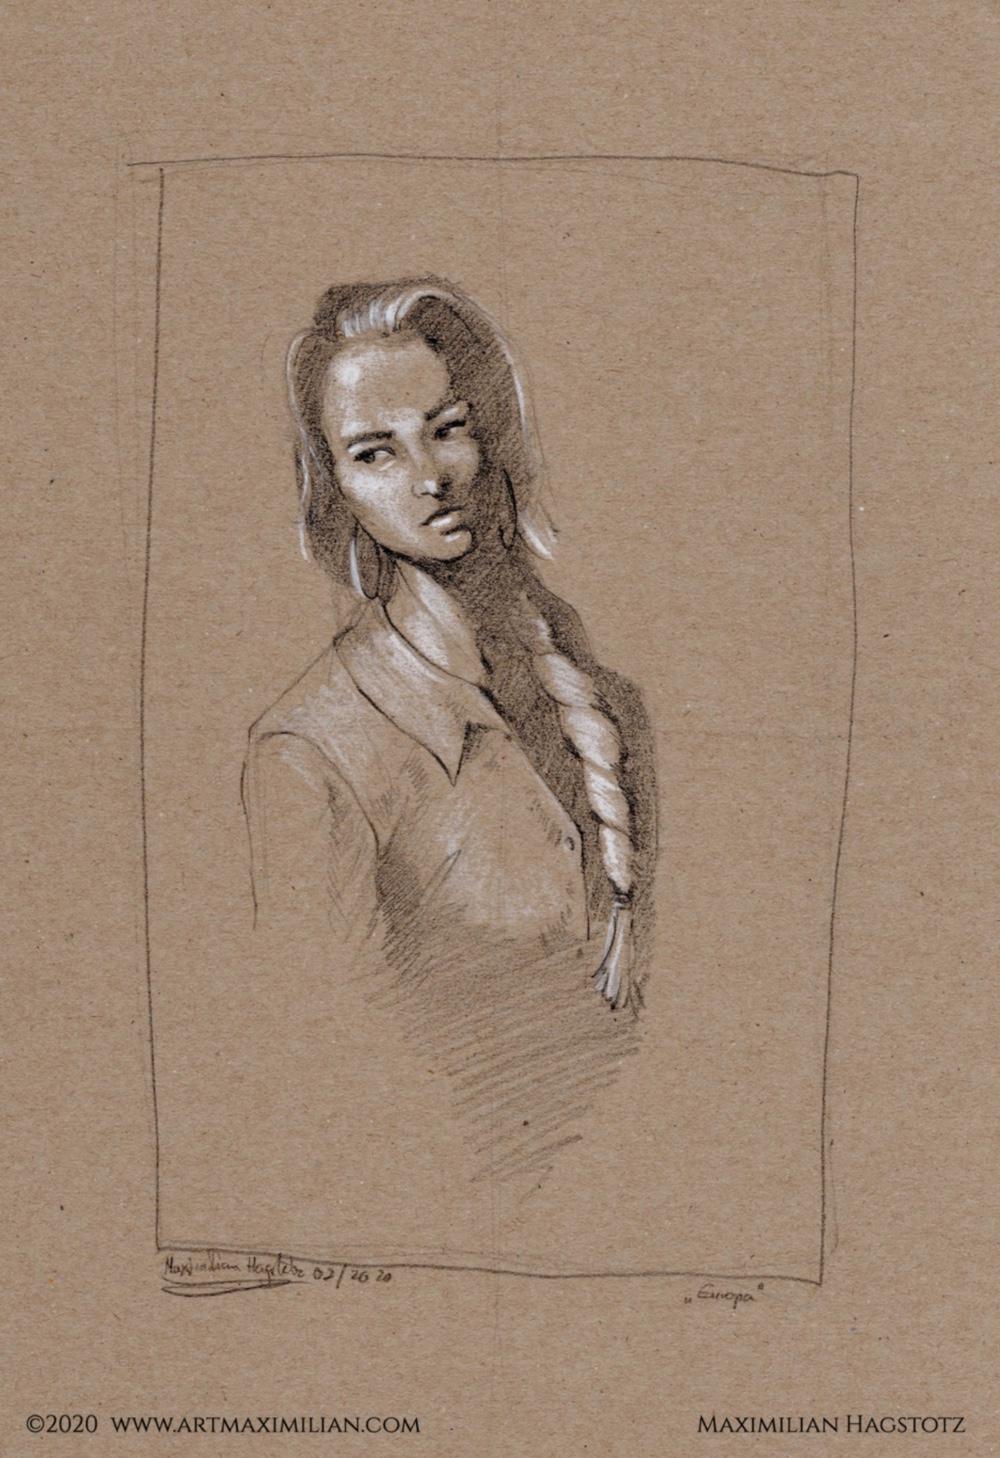 Zeichnung Grafik Kunst Maximilian Hagstotz Afrika Frau Porträt weiß Ohrringe Ausdruck Charakter set Geschenkidee Europa Zopf